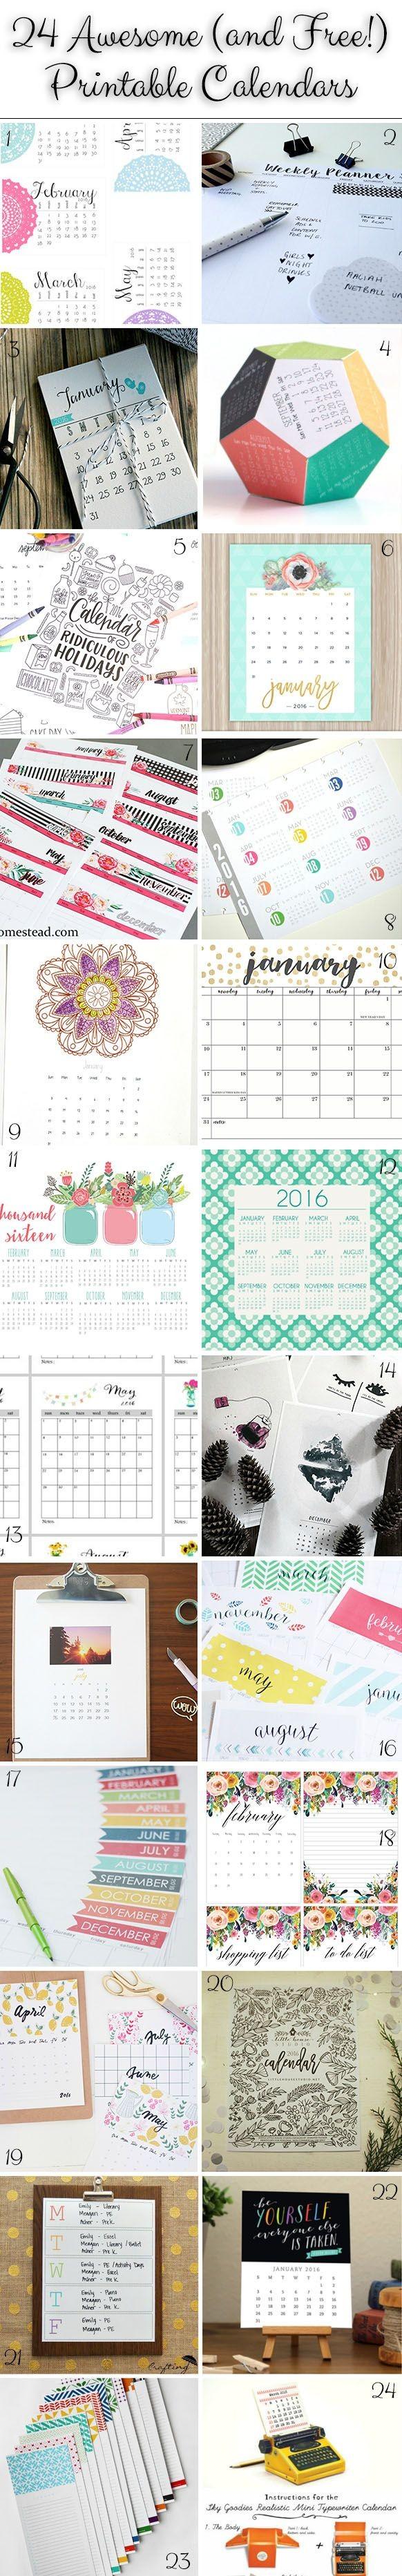 Calendario Mensual Para Imprimir Agosto 2017 Más Arriba-a-fecha 9 Best Calendário Images On Pinterest